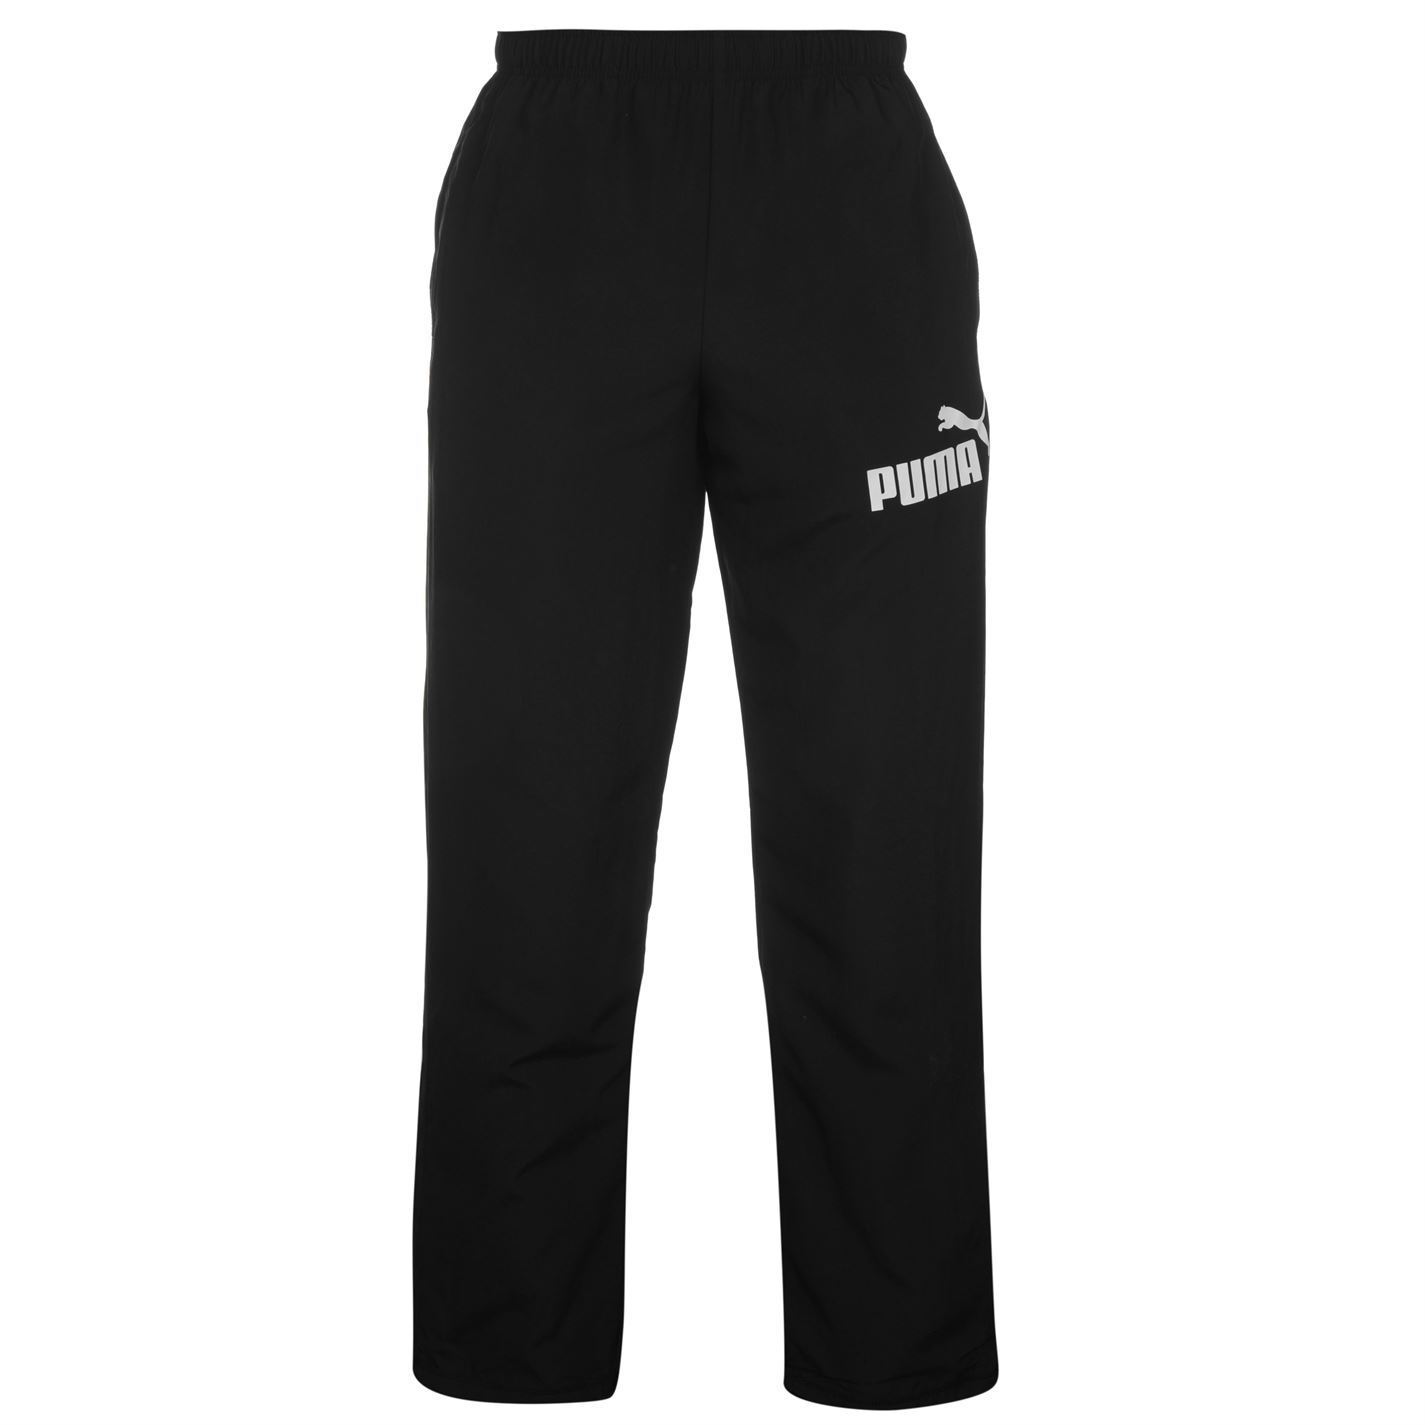 Puma mens clothing online